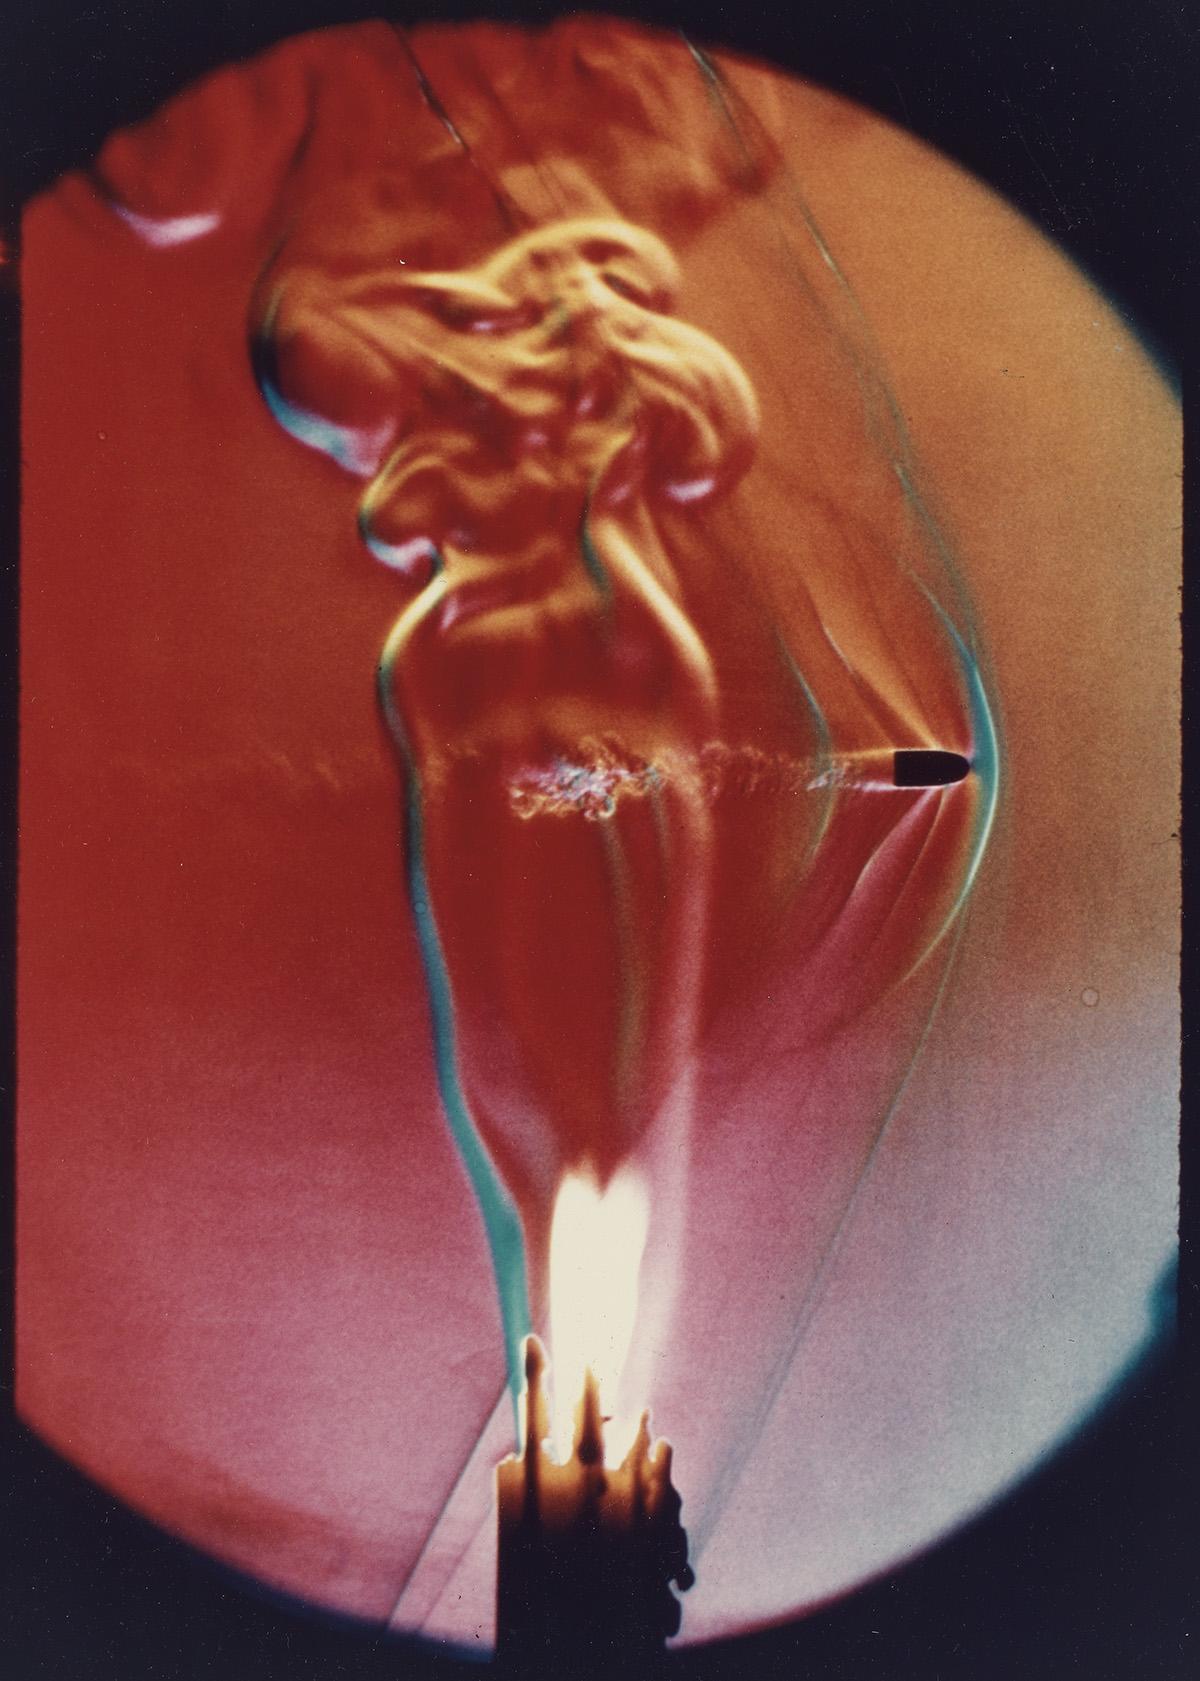 HAROLD-EDGERTON-(1903-1990)-Bullet-through-candle-flame